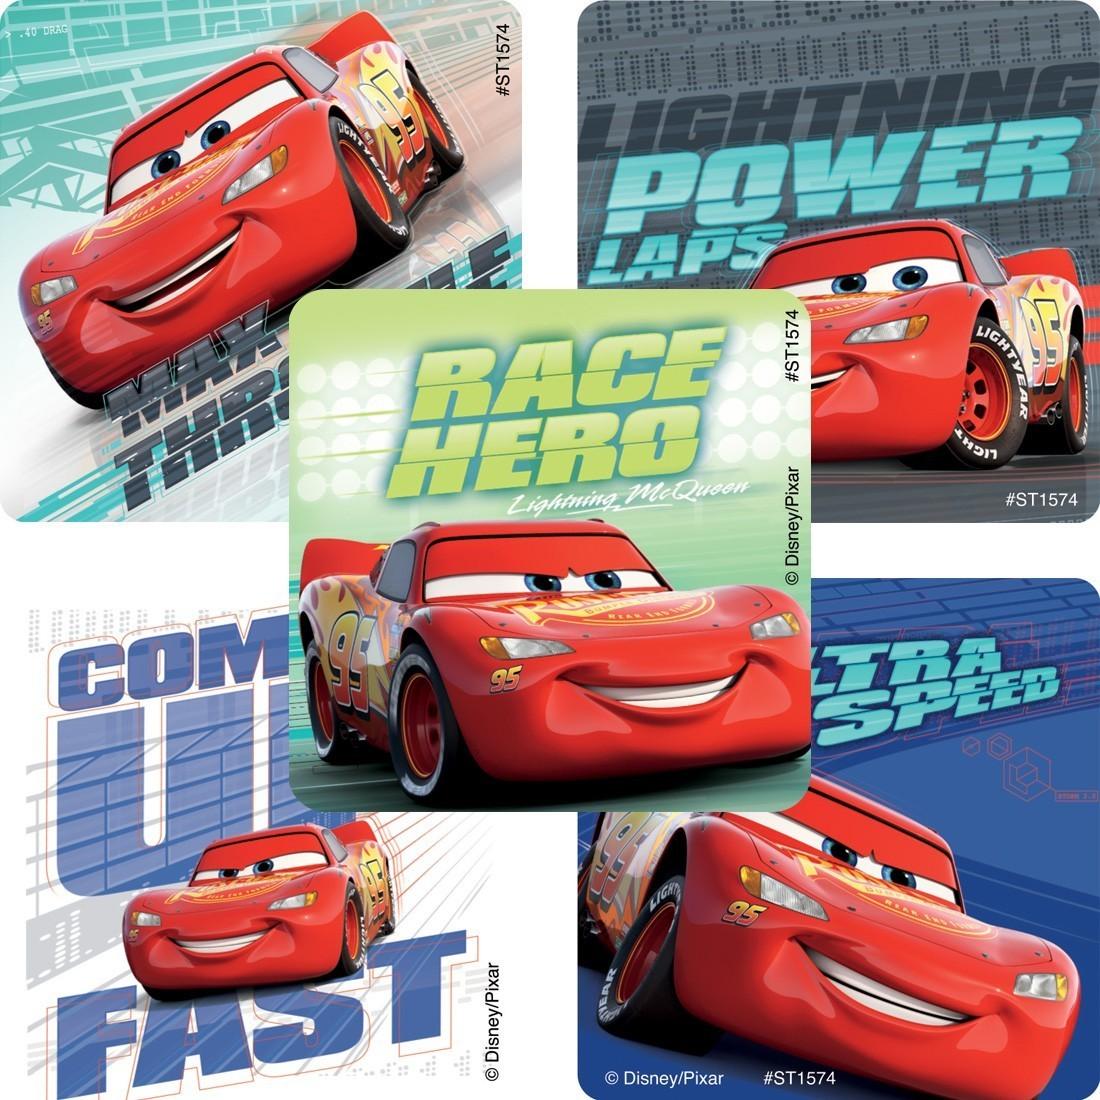 Disney*Pixar Cars Lightning McQueen Favorites Stickers [image]